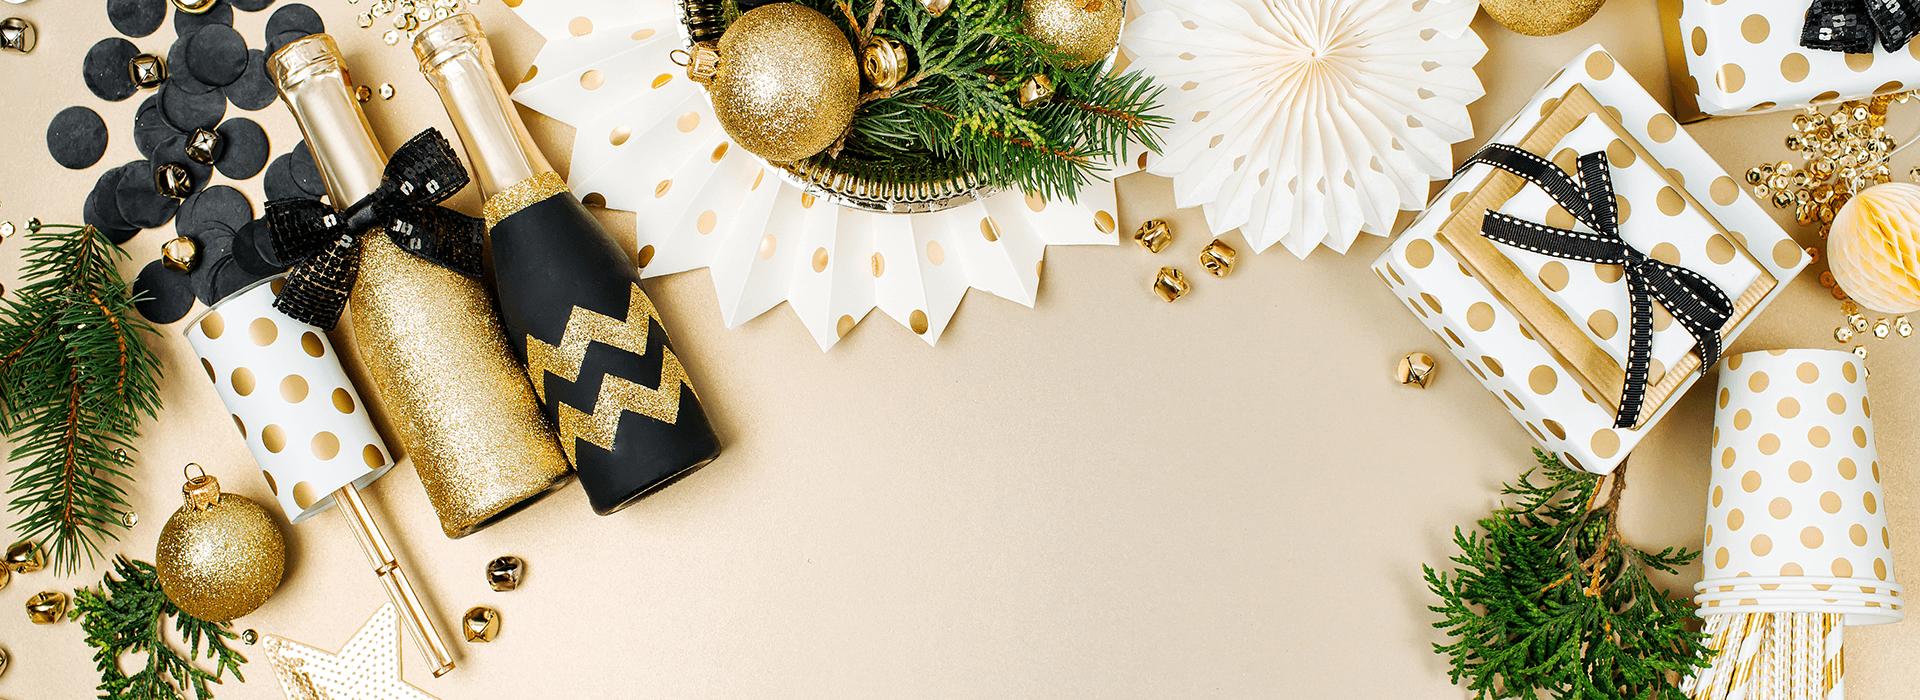 Corporate Christmas Champagne Gift Baskets USA